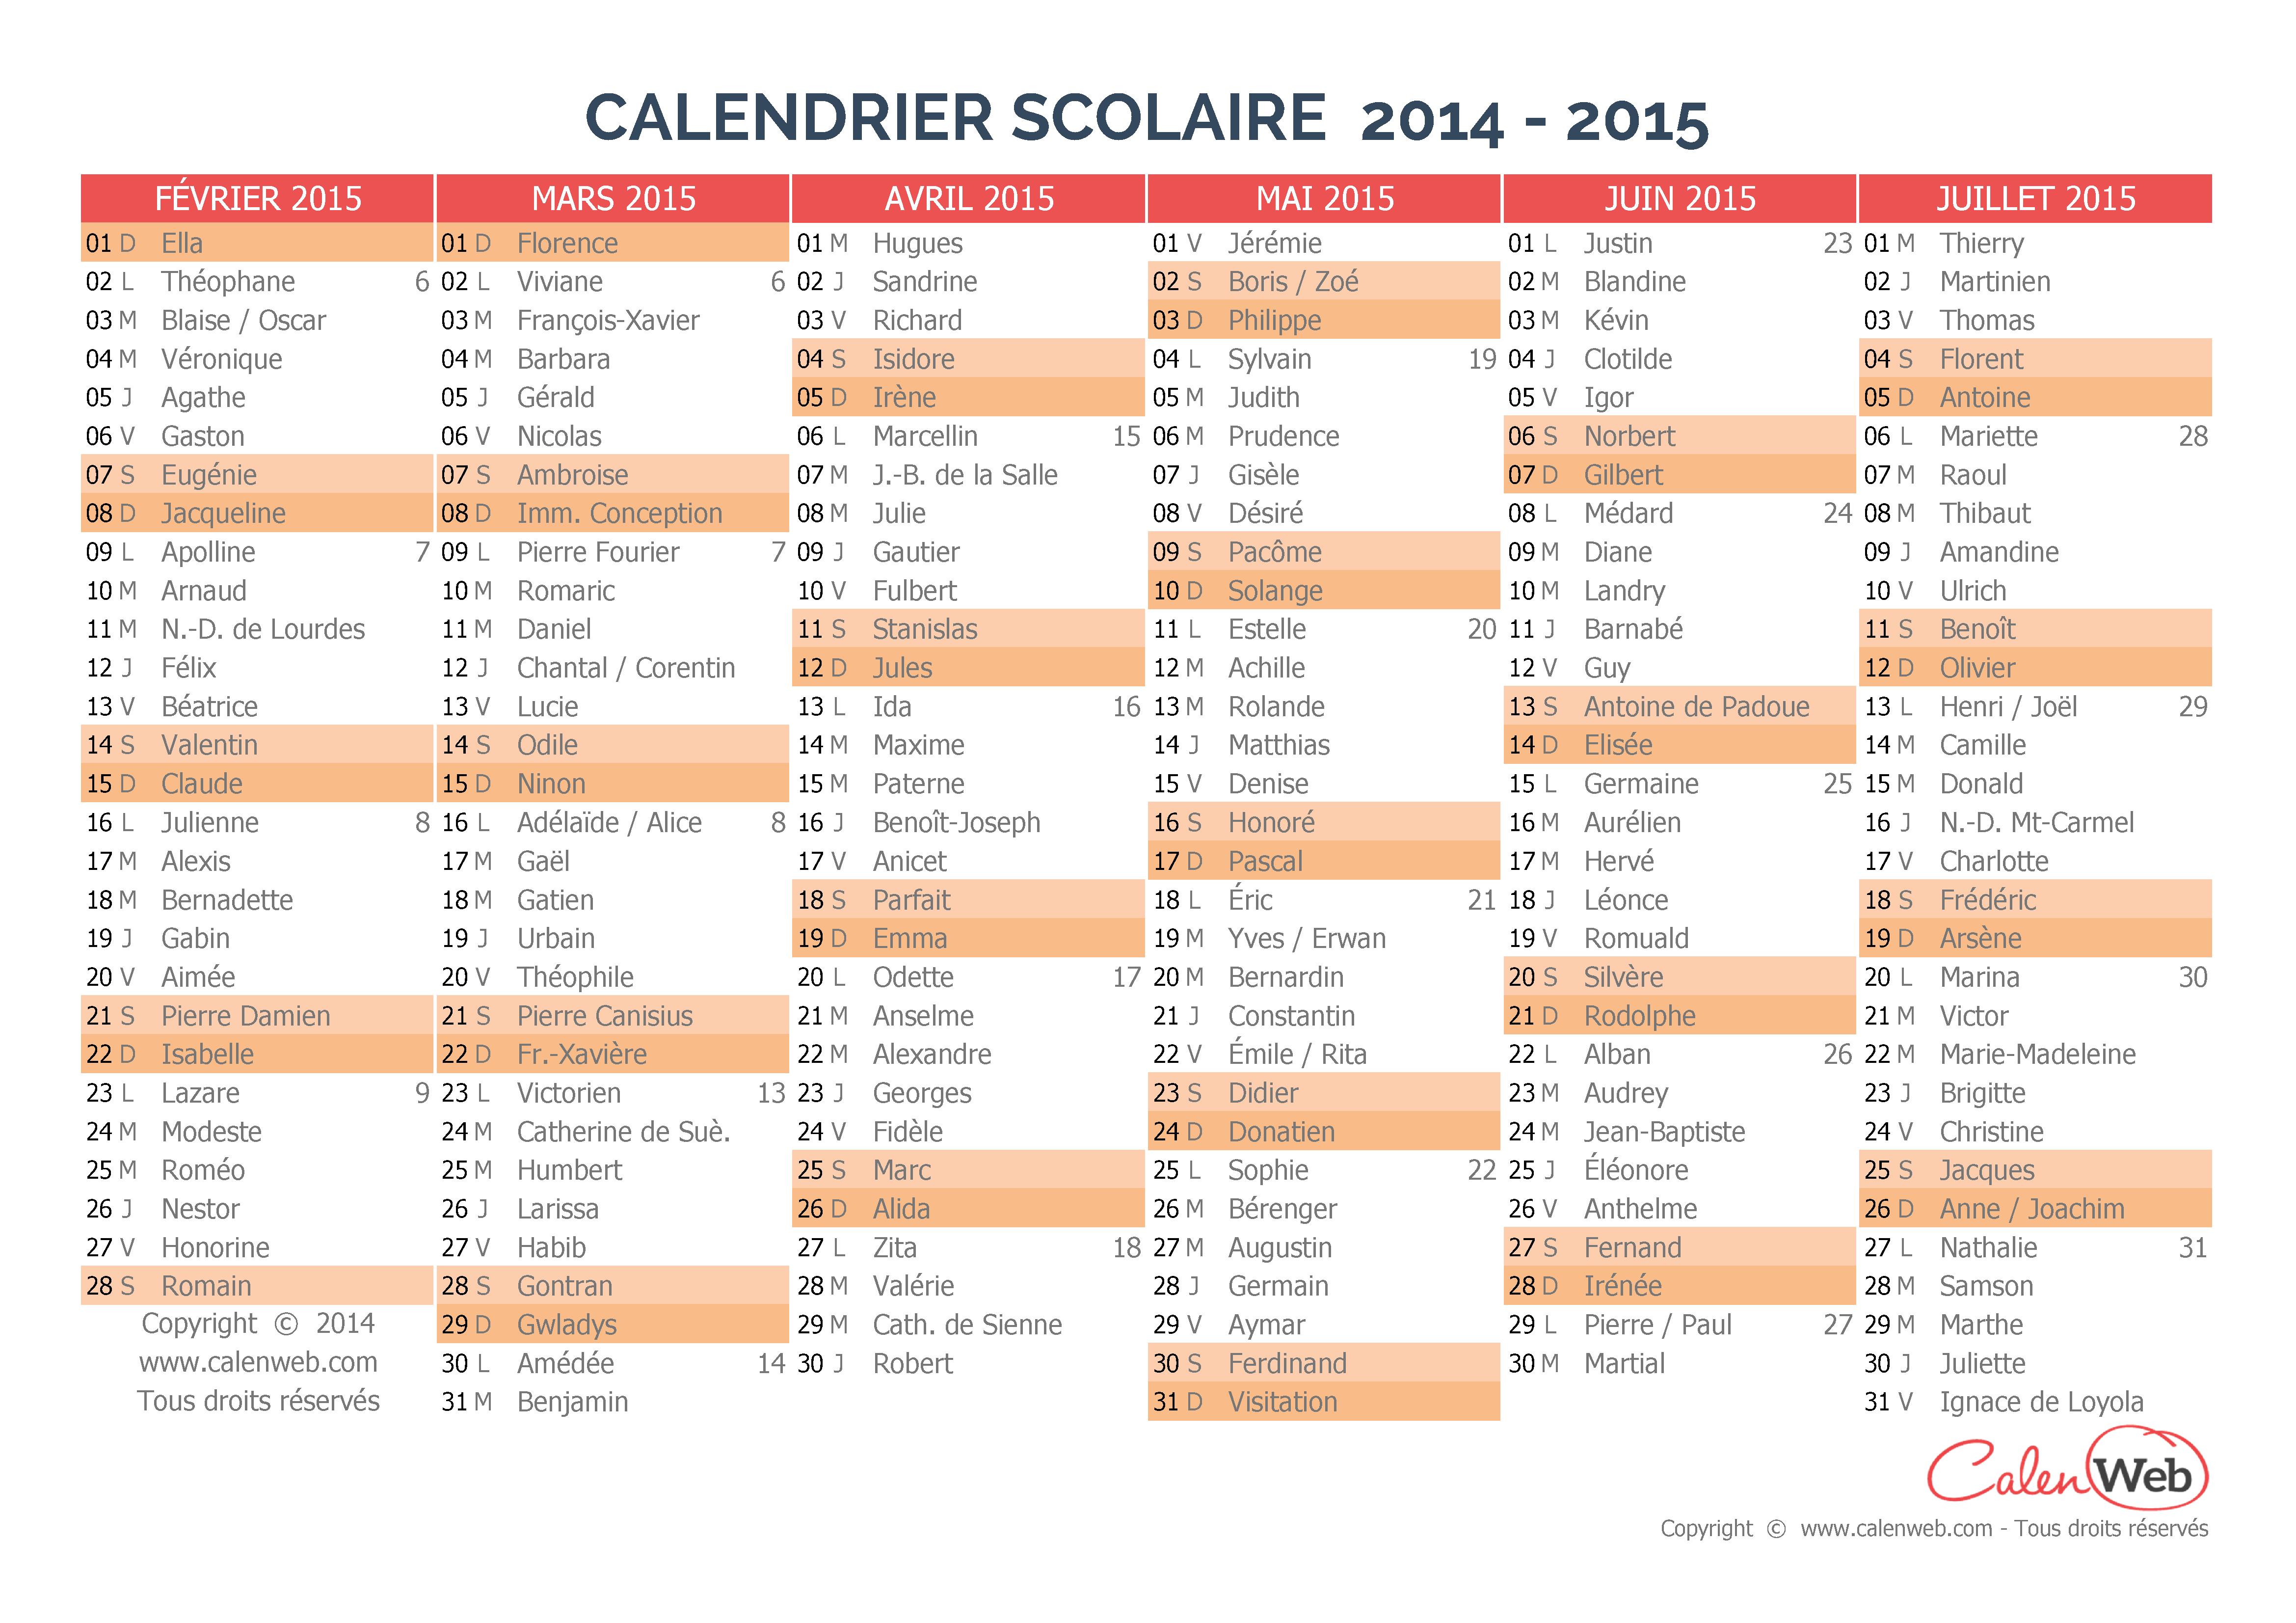 Calendriers scolaires semestriels - Calendrier scolaire 2014 2015 ...